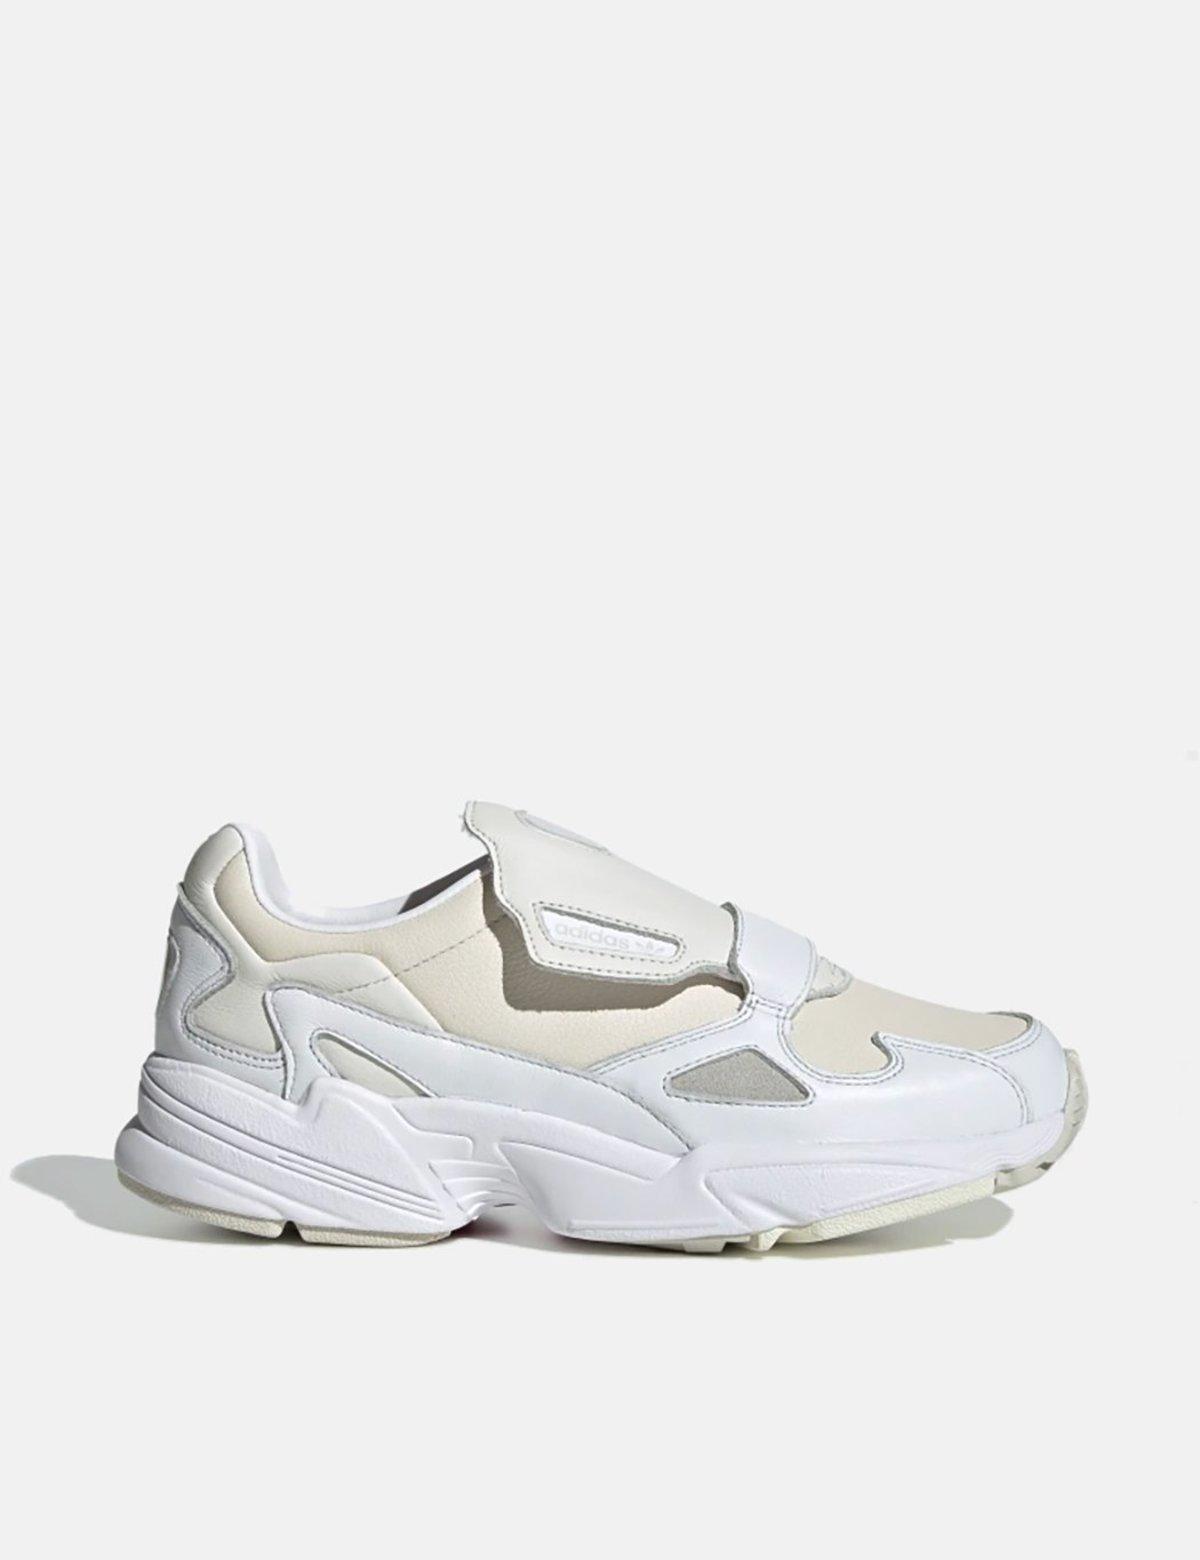 adidas falcon offwhite